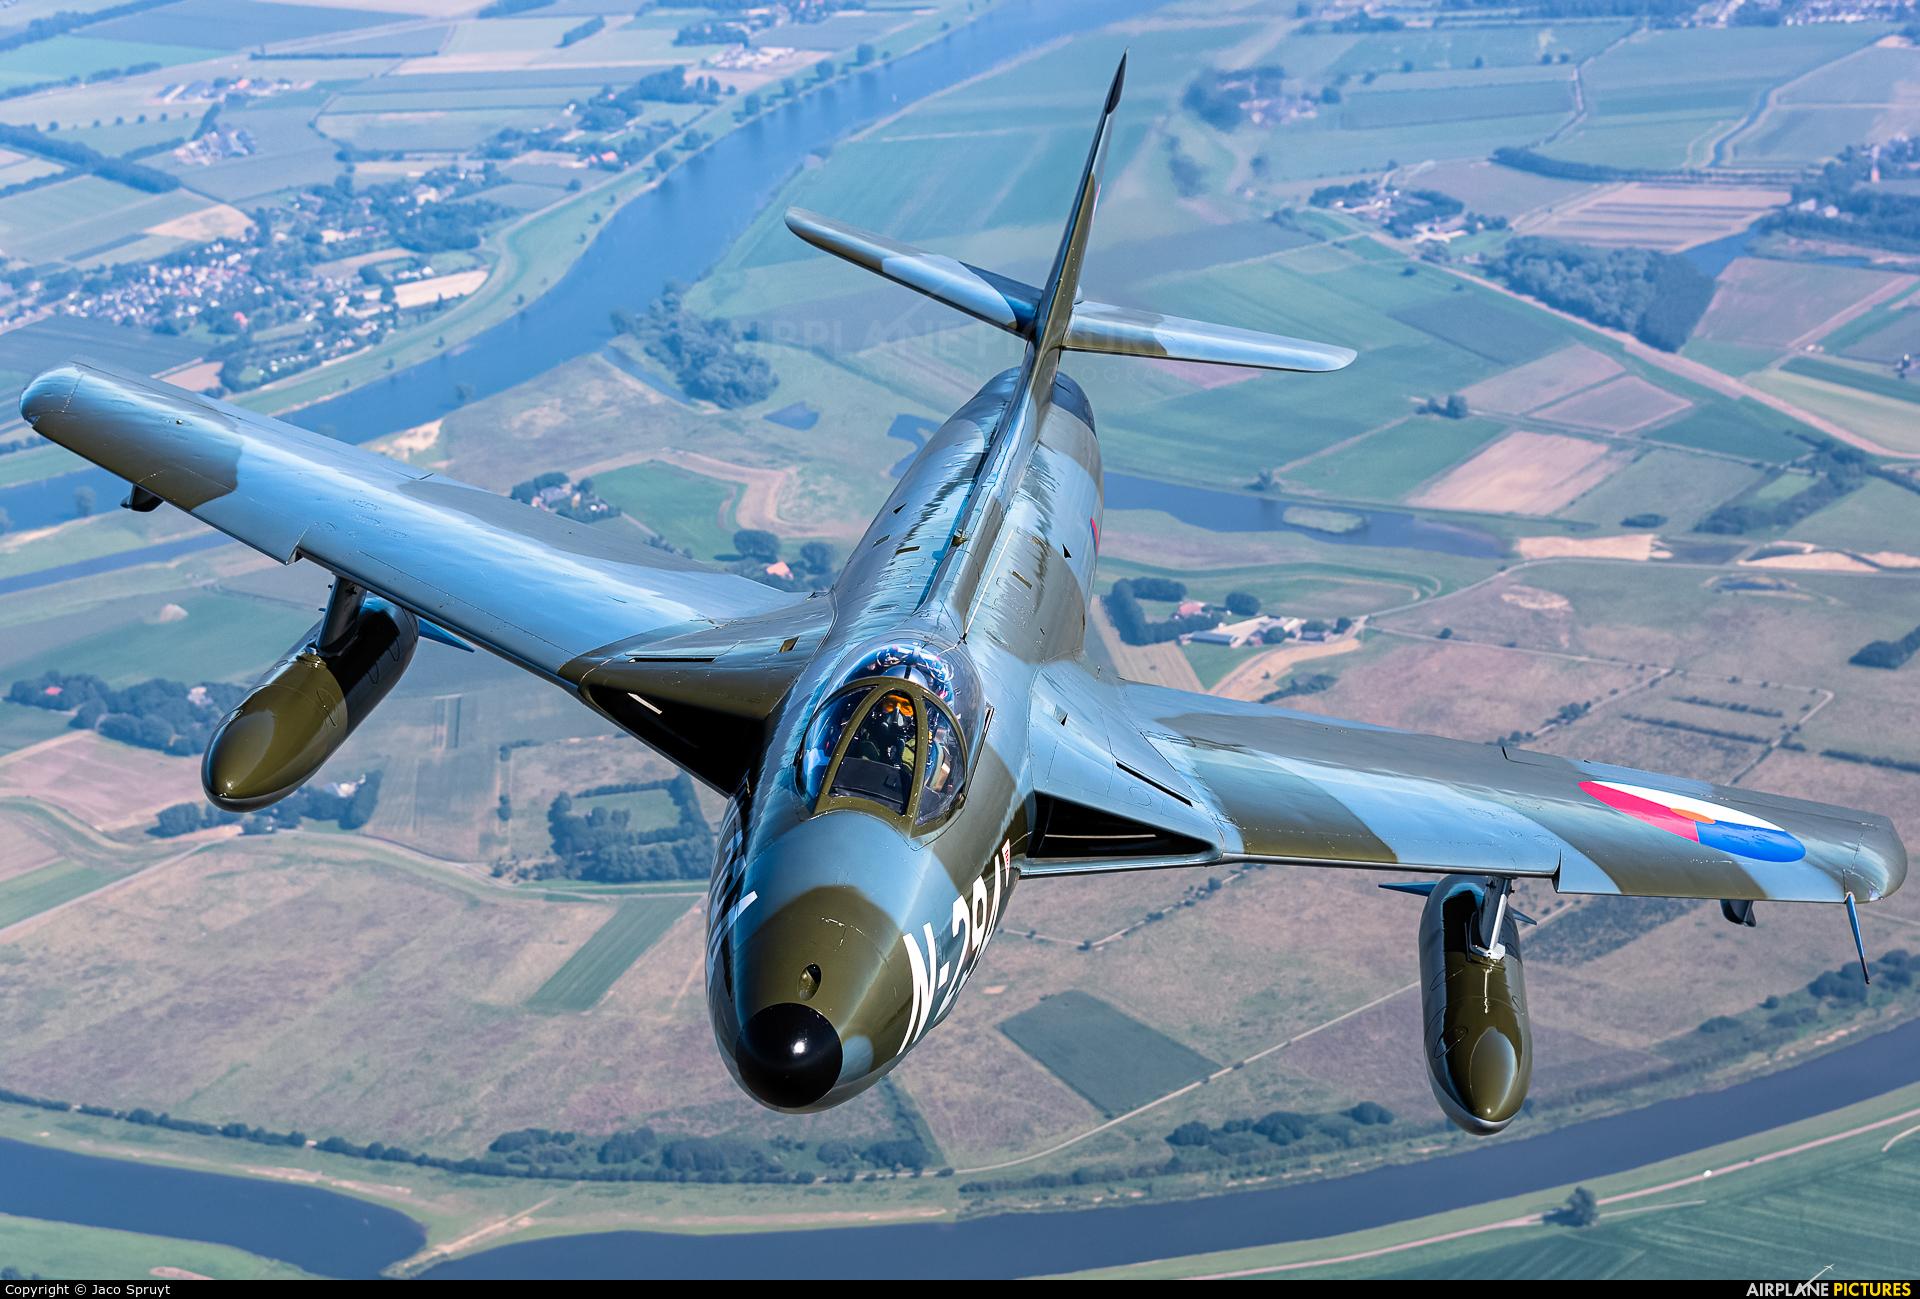 Dutch Hawker Hunter Foundation N-294 aircraft at In Flight - Netherlands